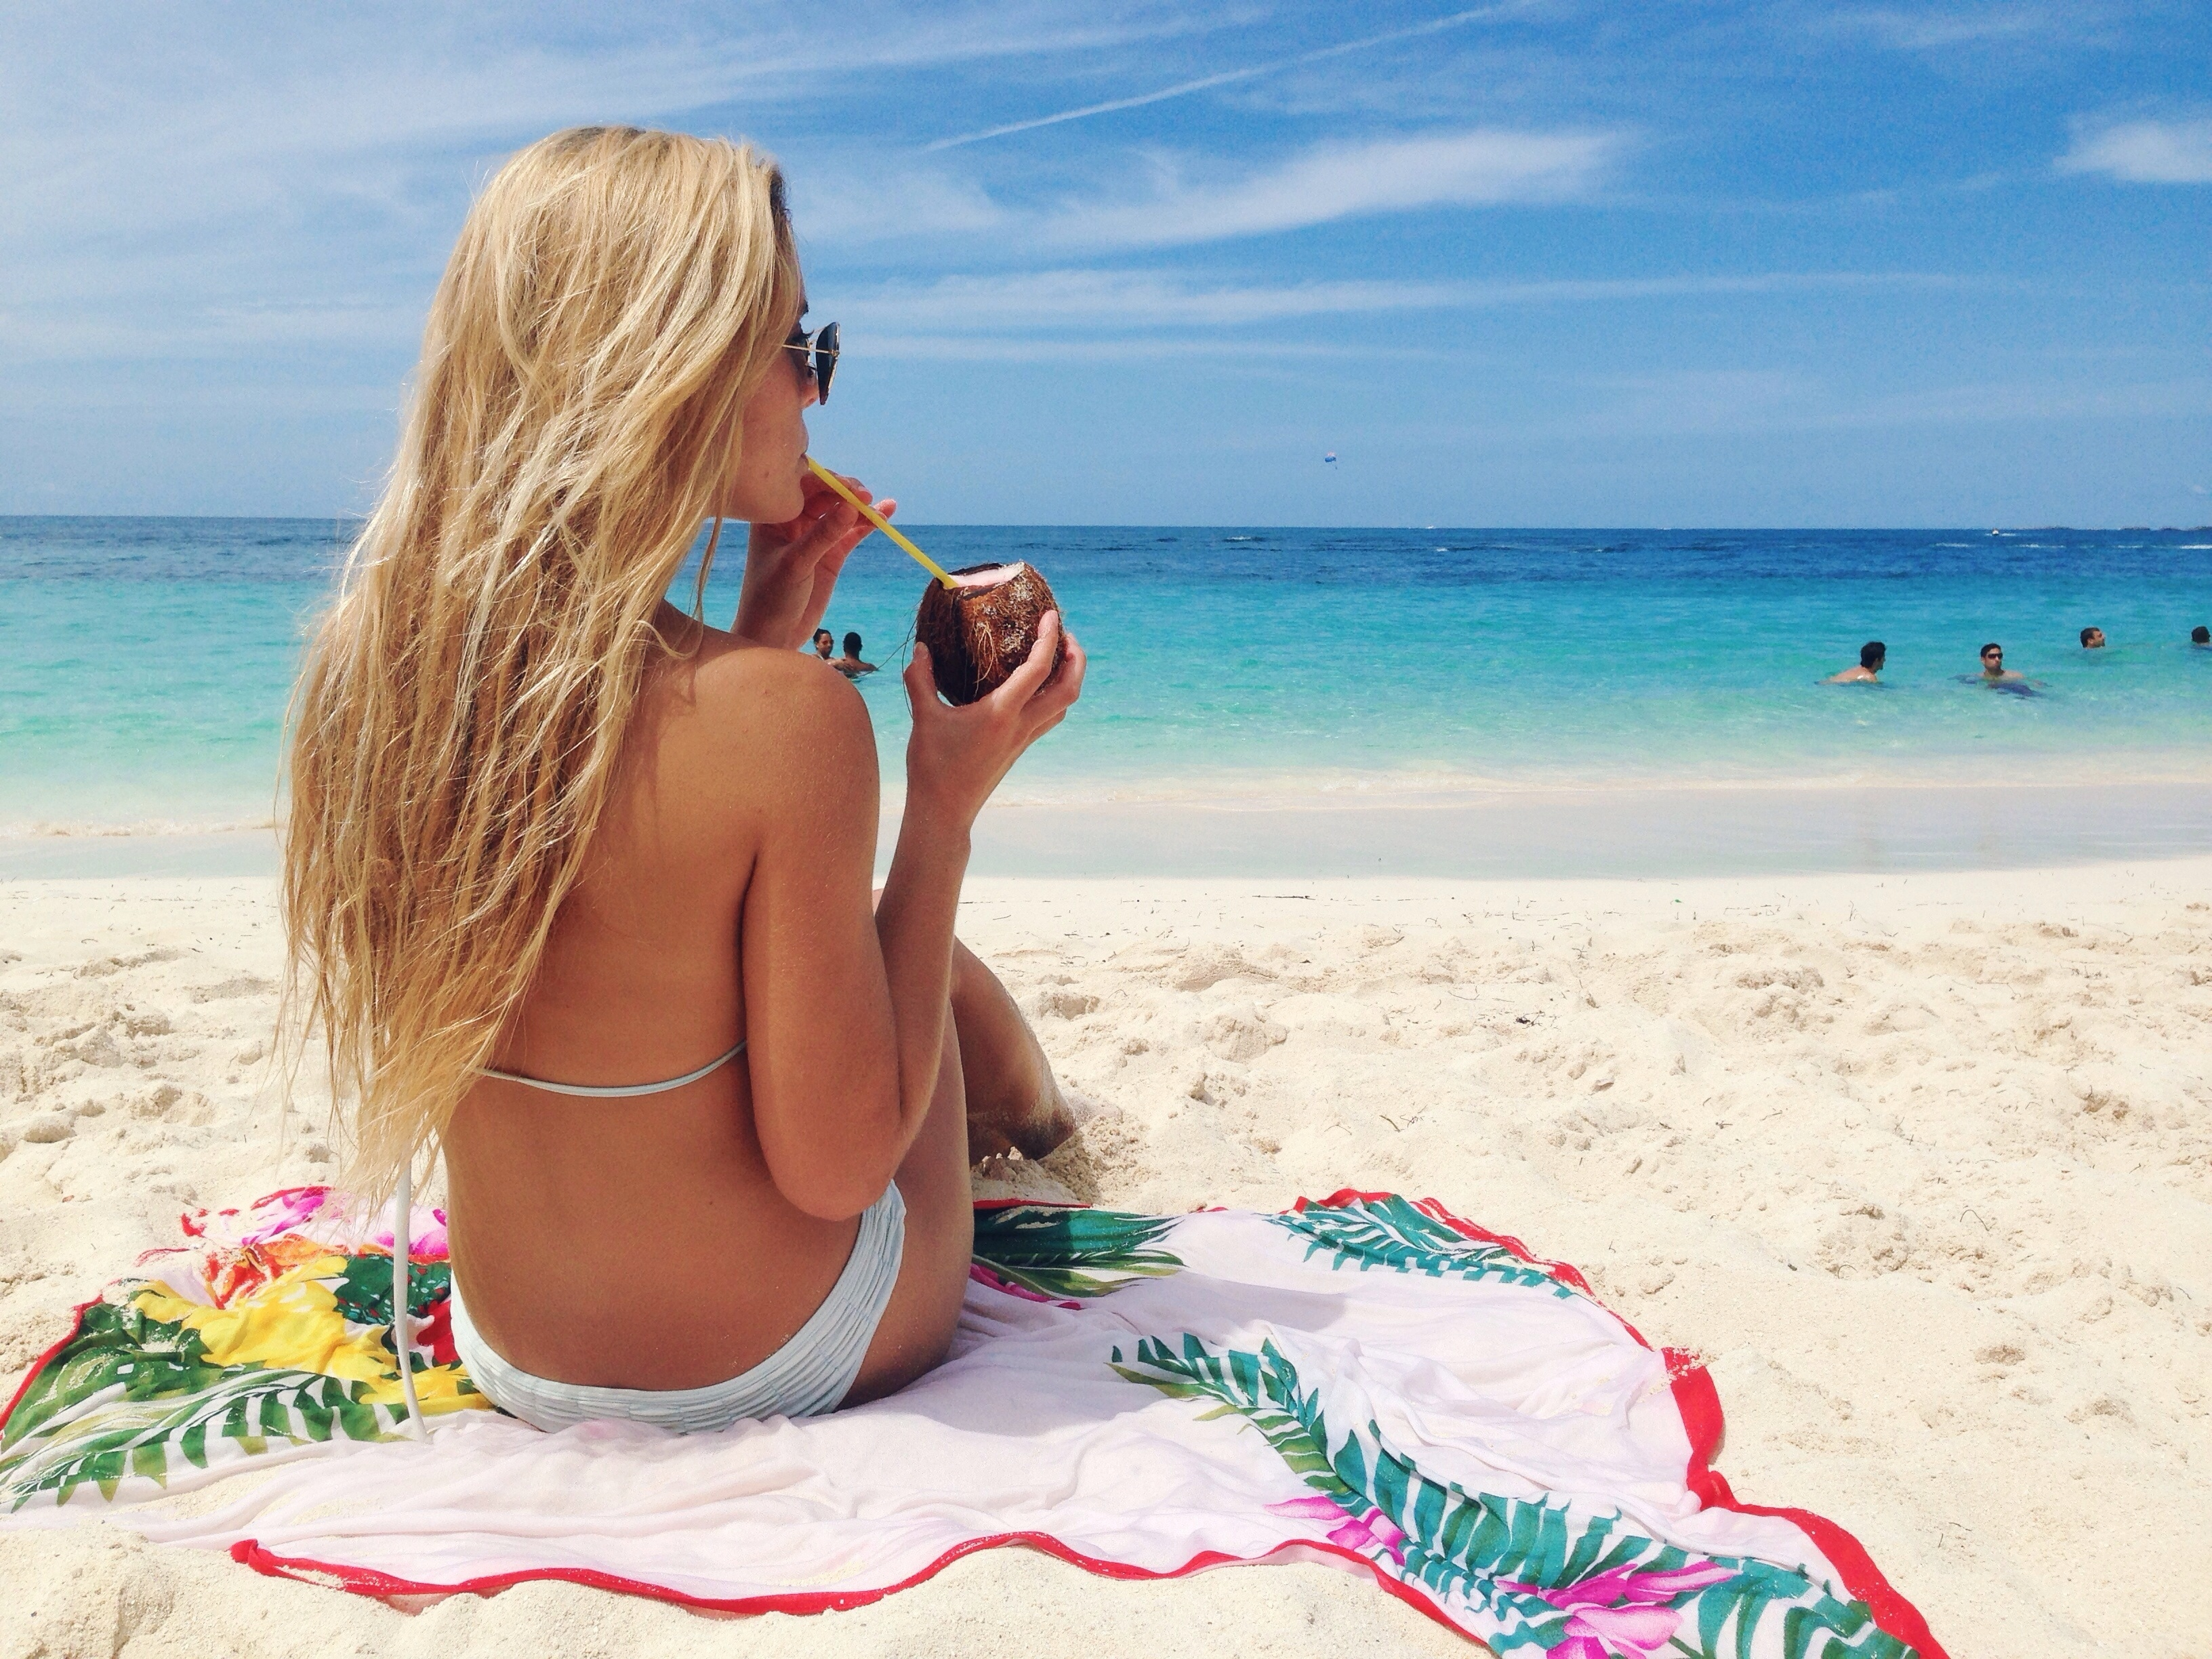 Rubia en bikini en Bahamas - 3264x2448